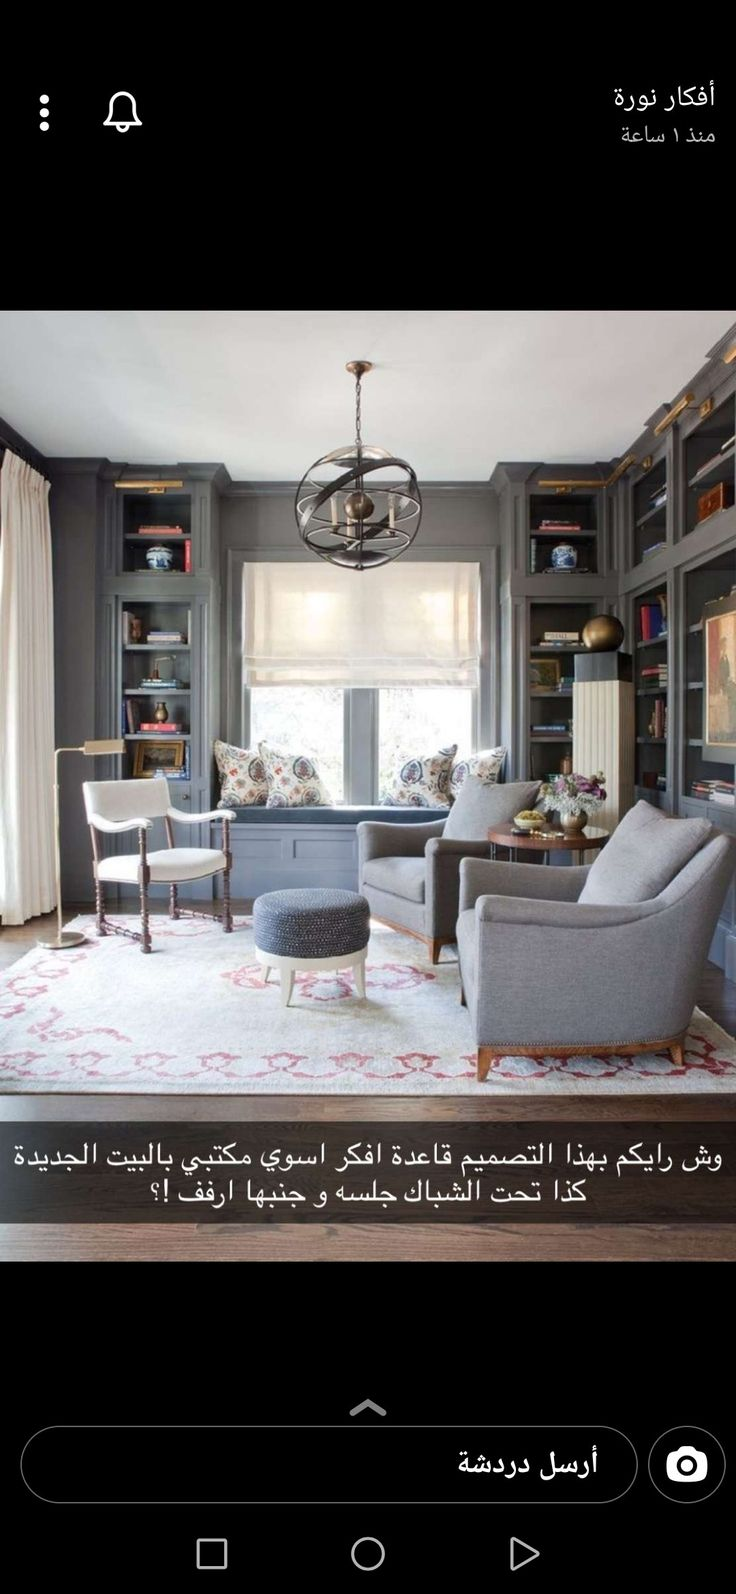 Pin By مسك الخروصي On ديكورات منزلية In 2020 Home Decor Home Furniture